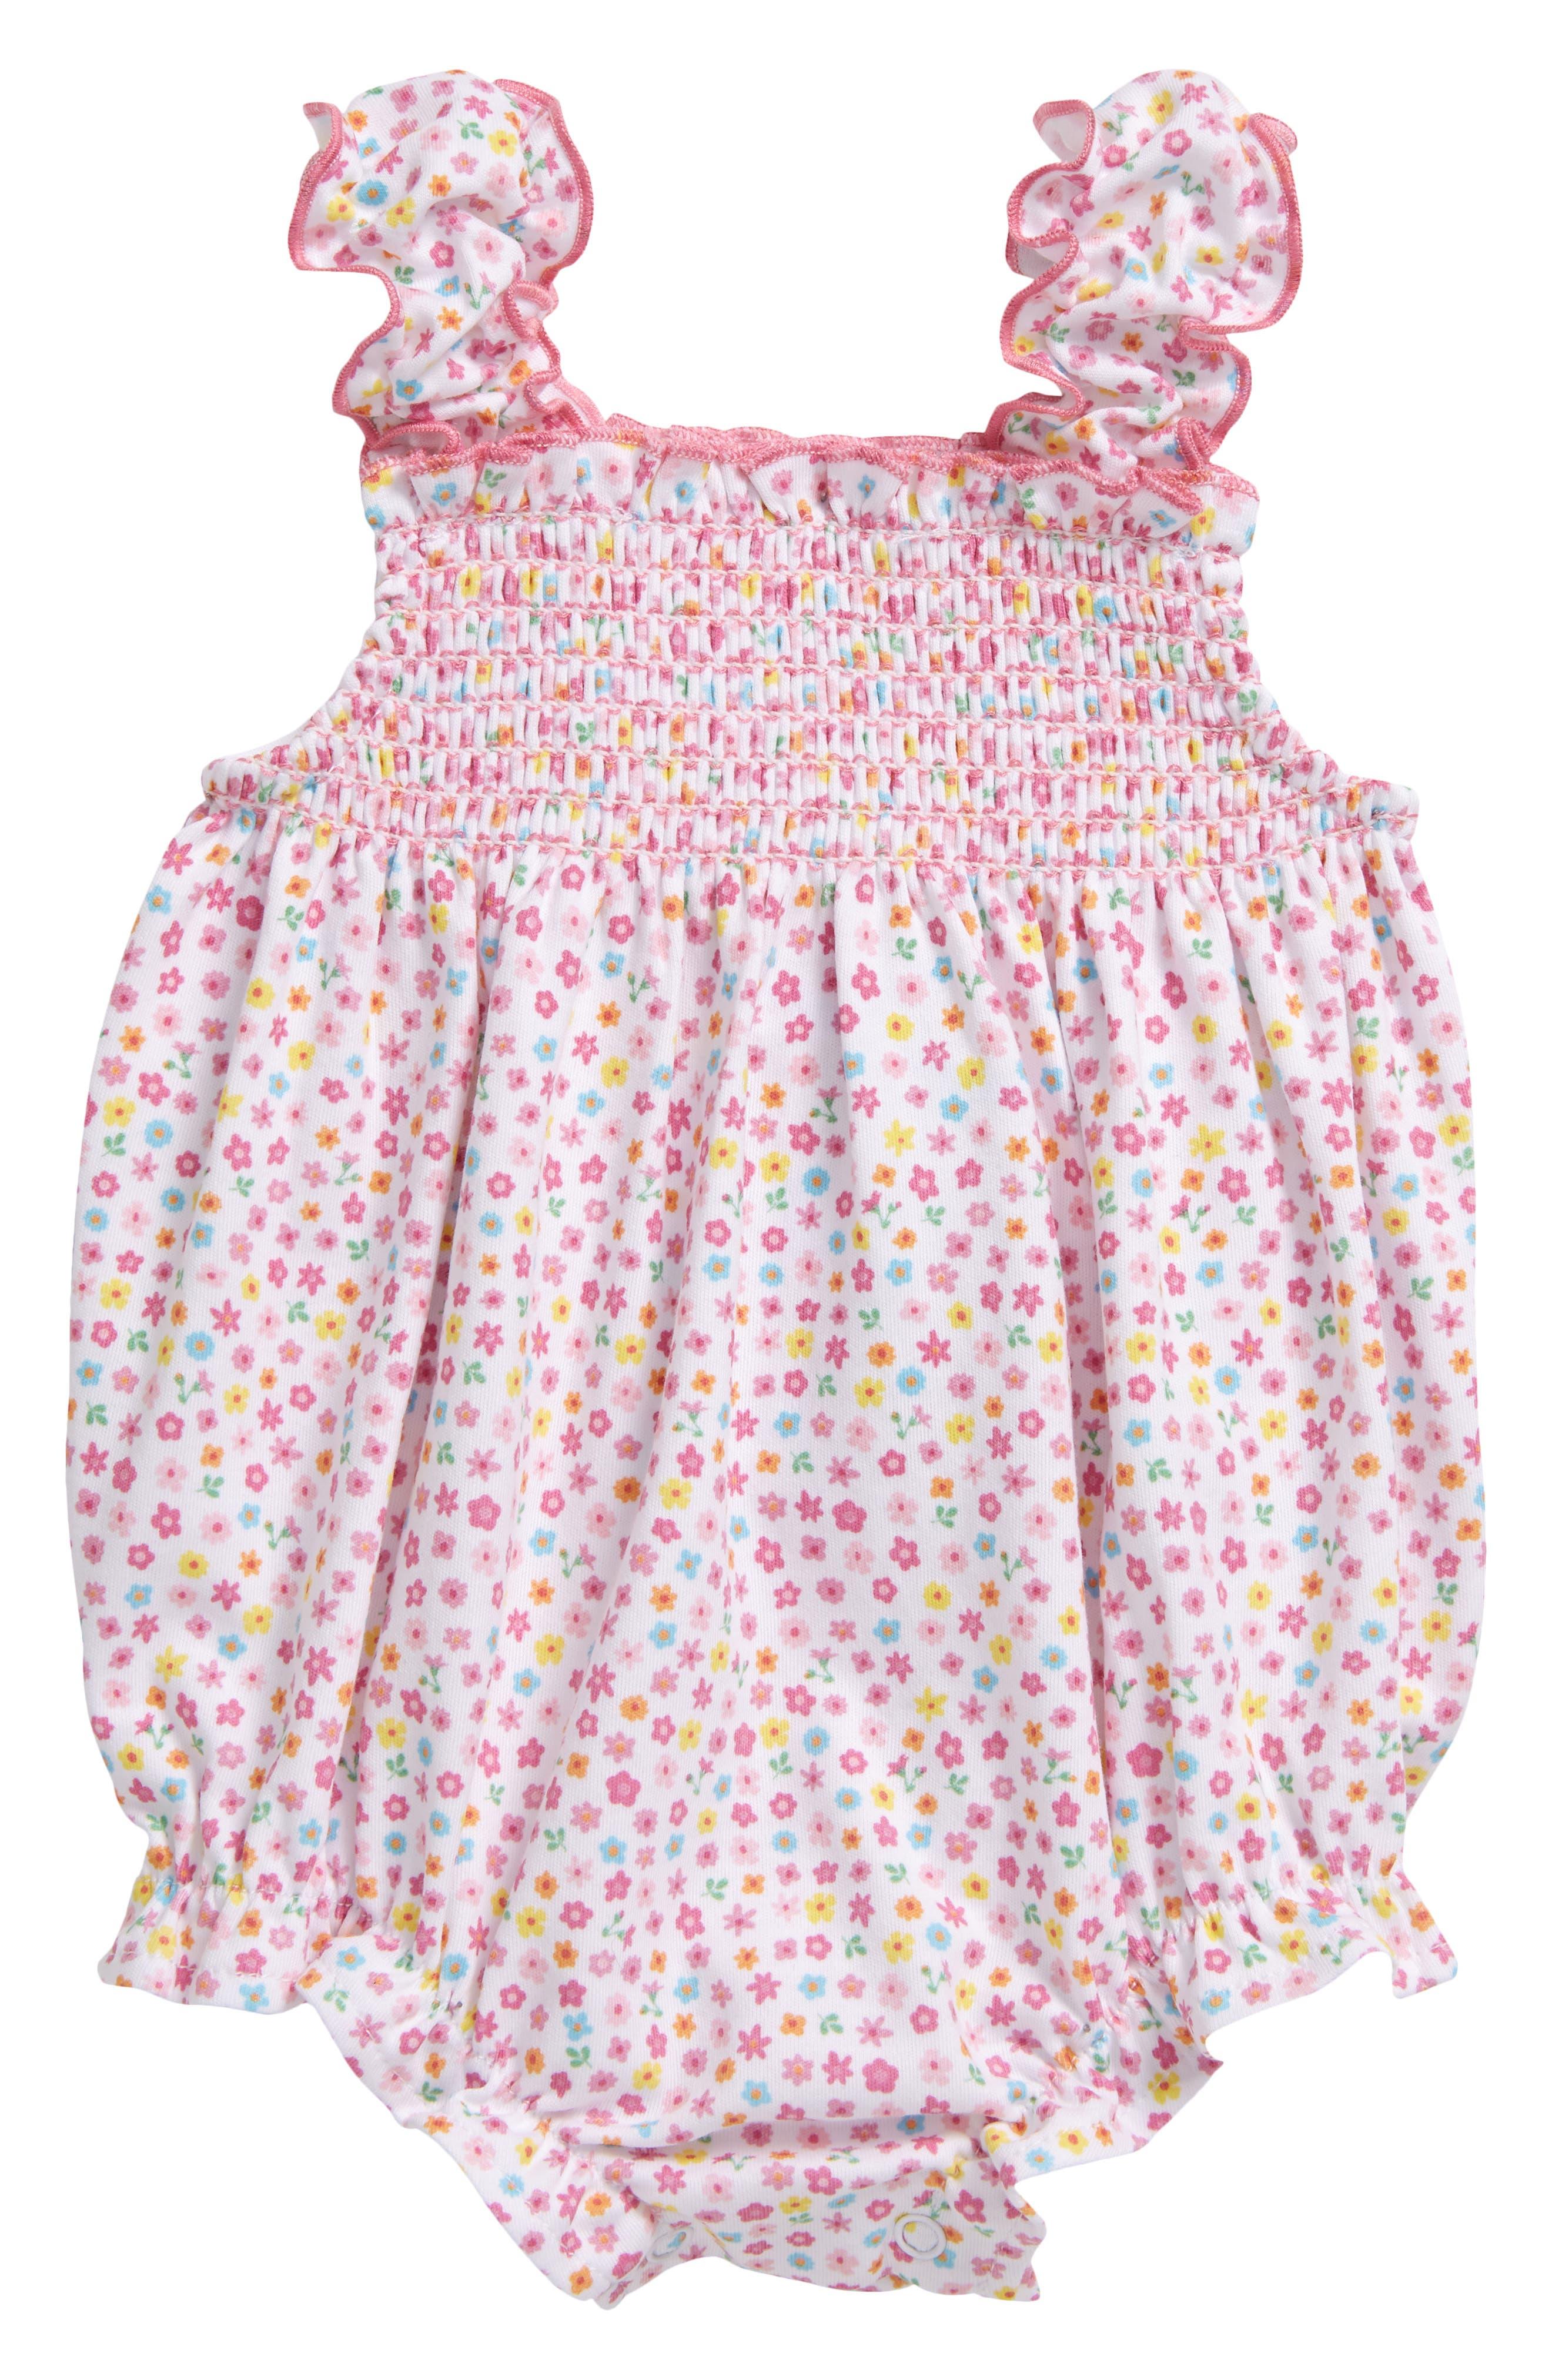 Kissy Kissy Infant Girl's Kissy Kissy Unicorn Gardens Floral Bubble Romper, Size 18-24M - Pink